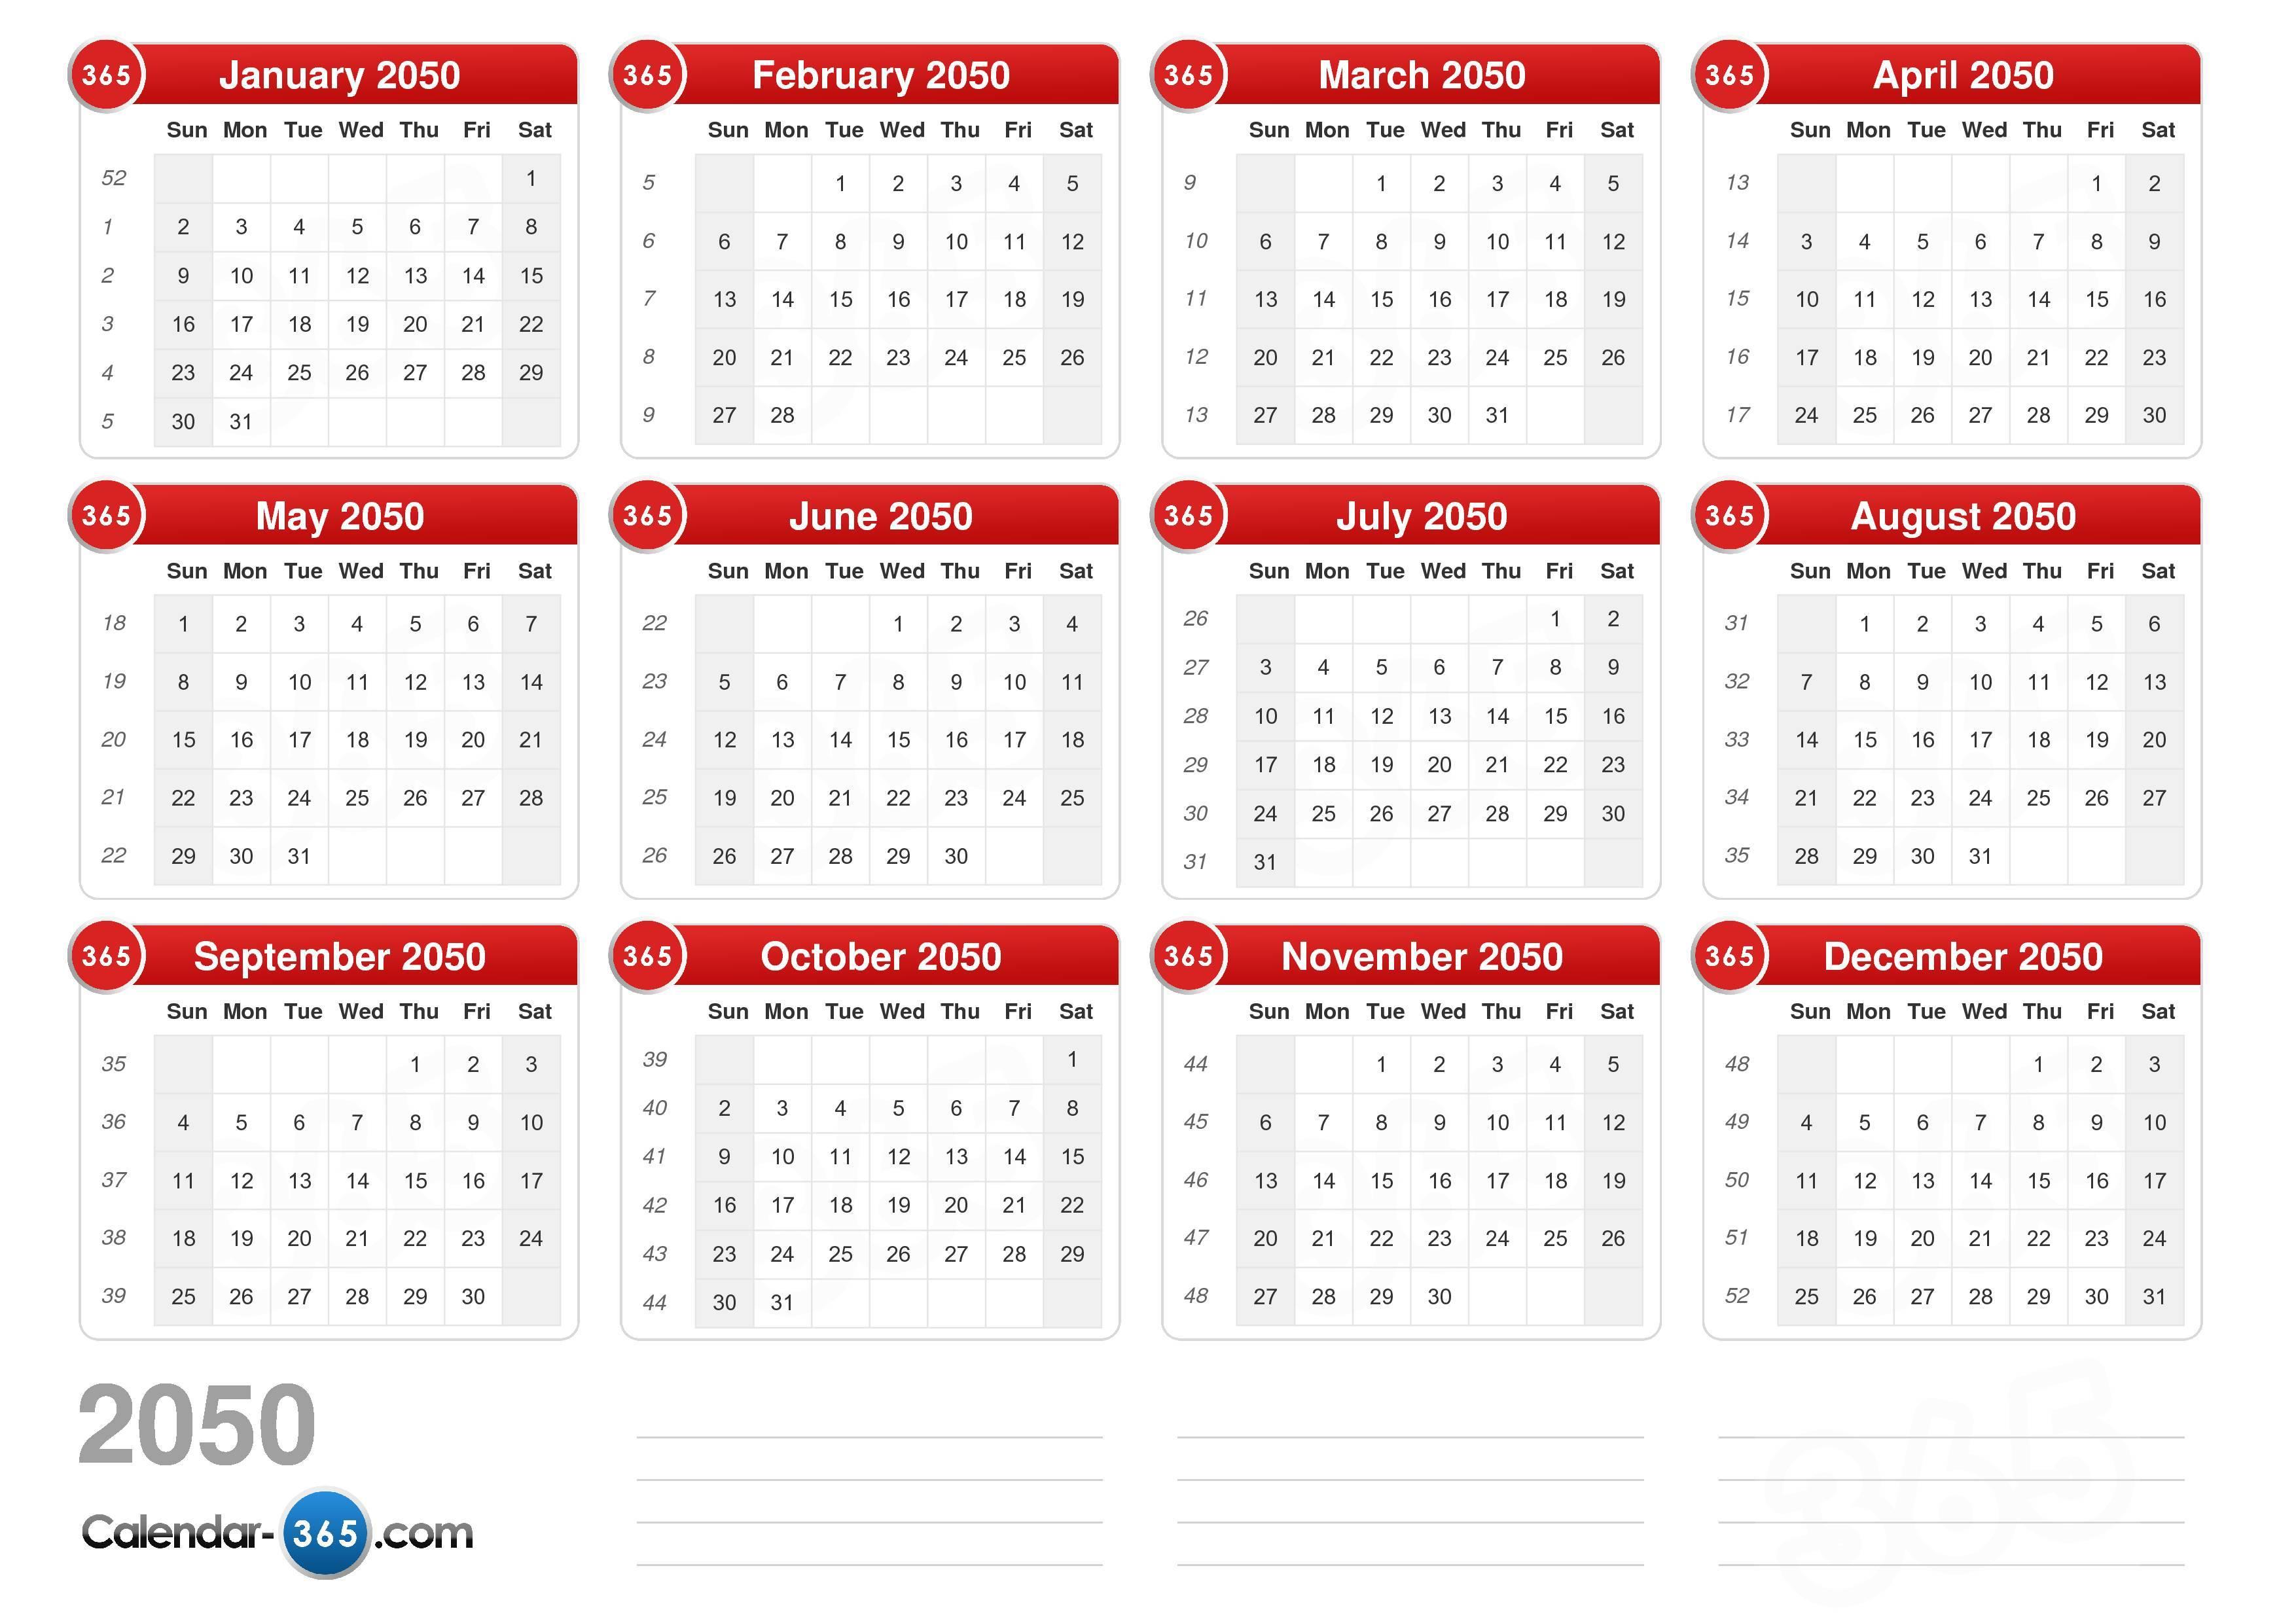 Calendars To Print Free Download Calendars Printfree Printable Monthly 2015 2050 Calendar